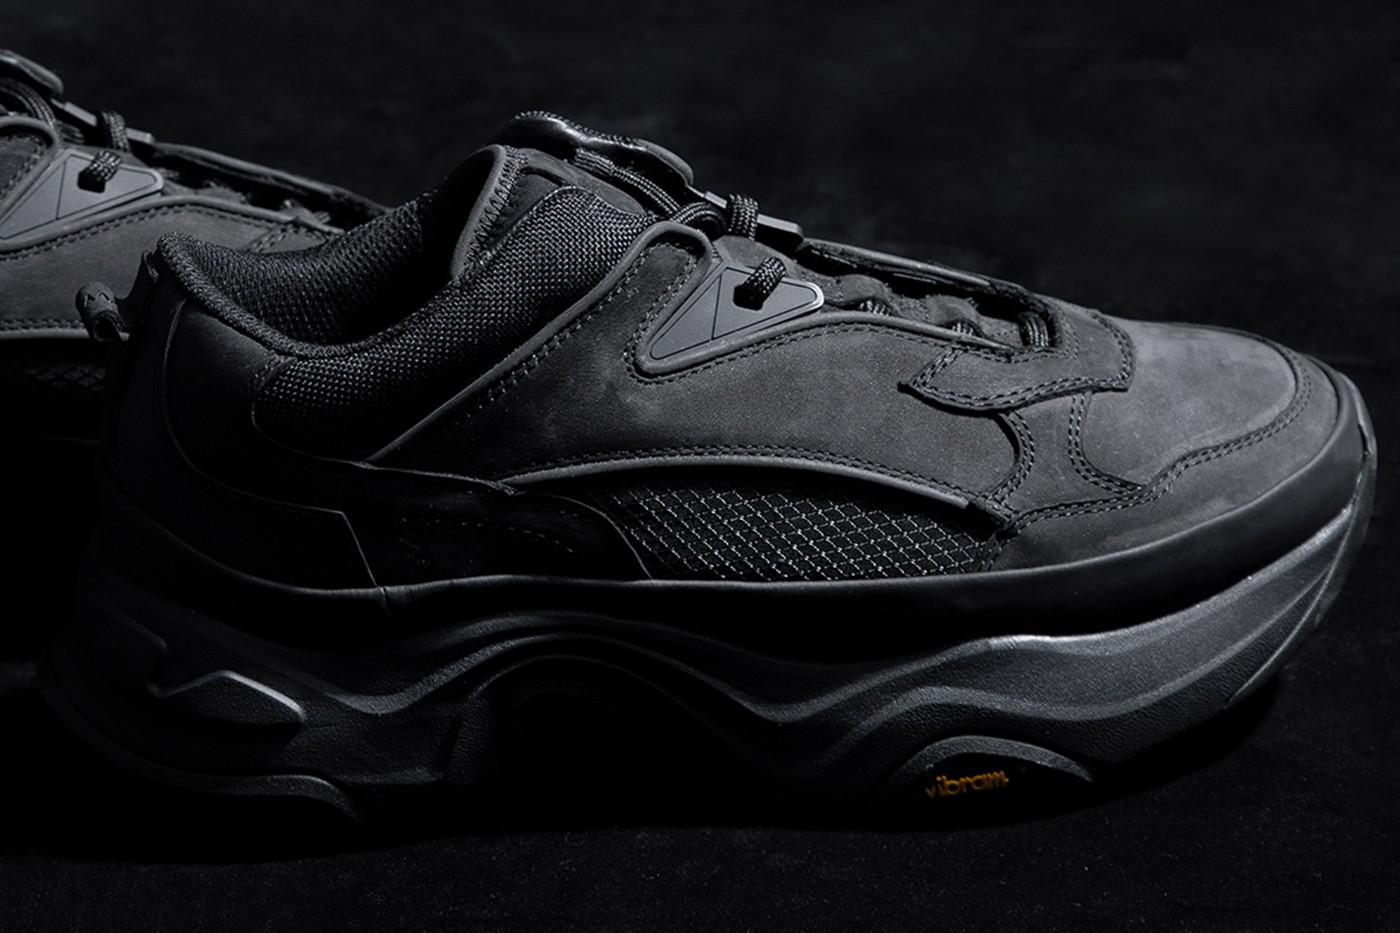 https___hypebeast.com_image_2020_11_c2h4-footwear-atom-alpha-quark-alpha-release-info-003